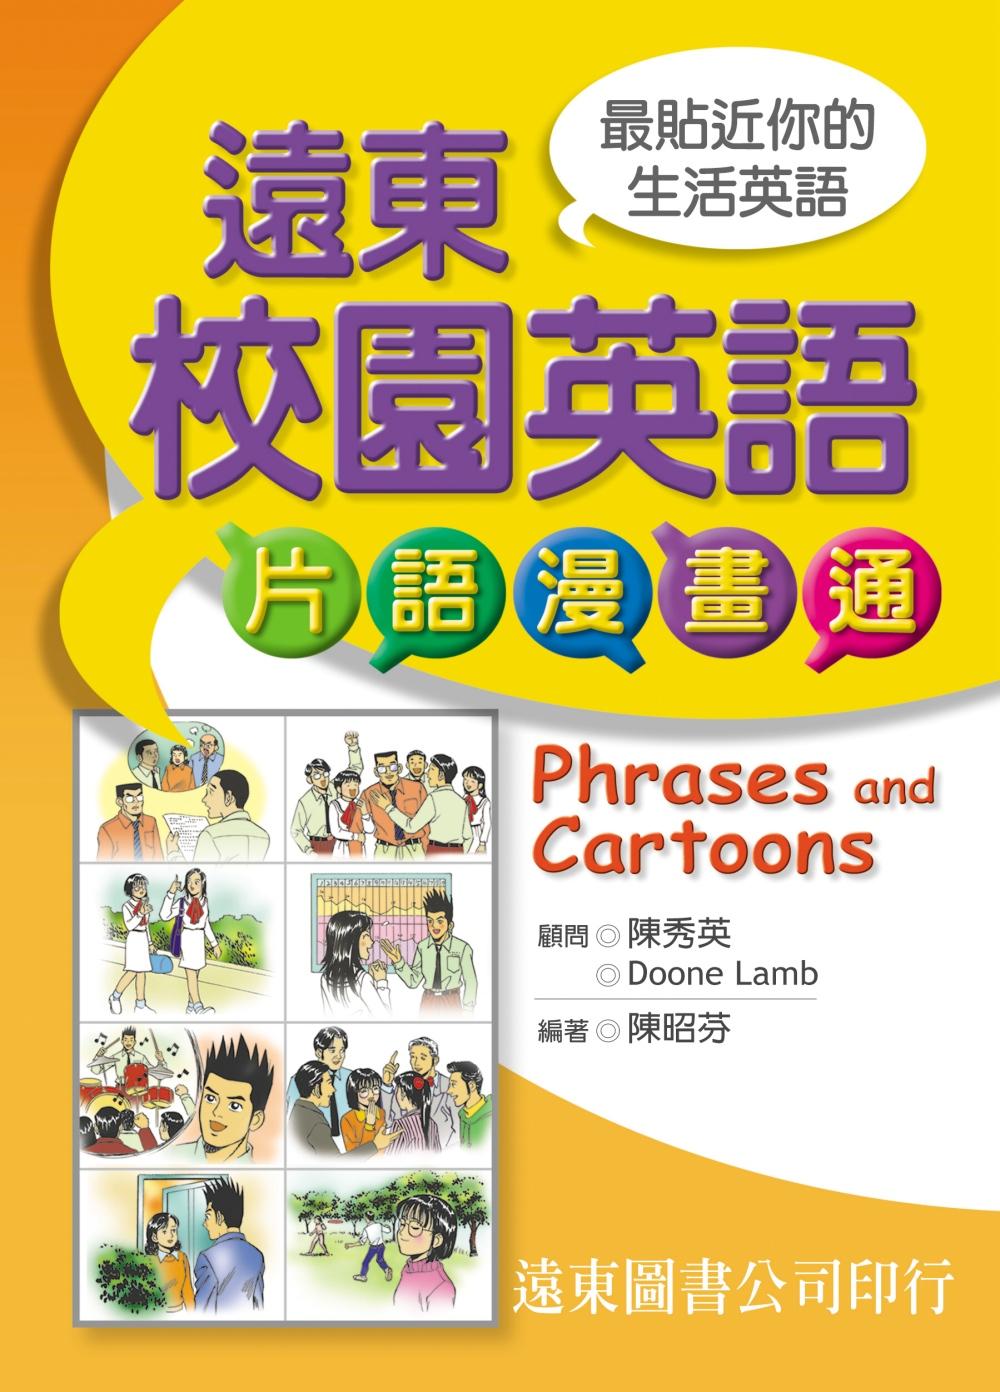 遠東片語漫畫通 = Phrases and cartoons